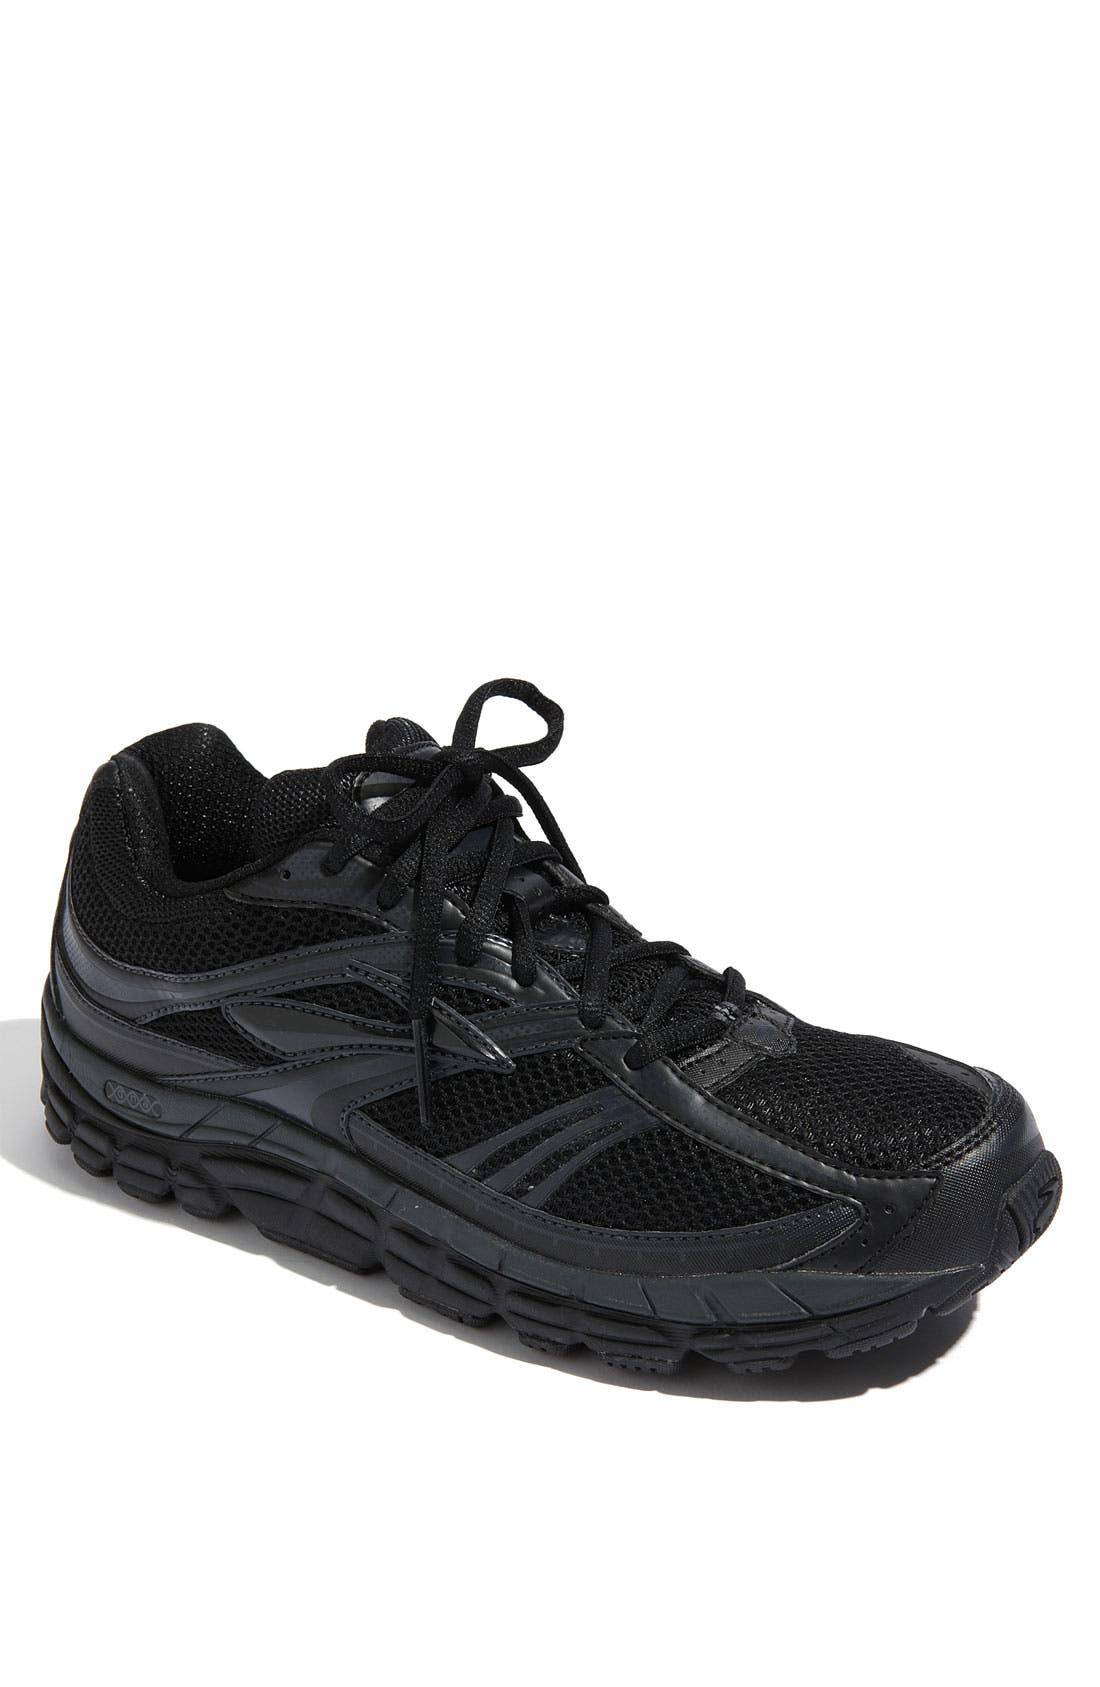 Main Image - Brooks 'Addiction 10' Running Shoe (Men)